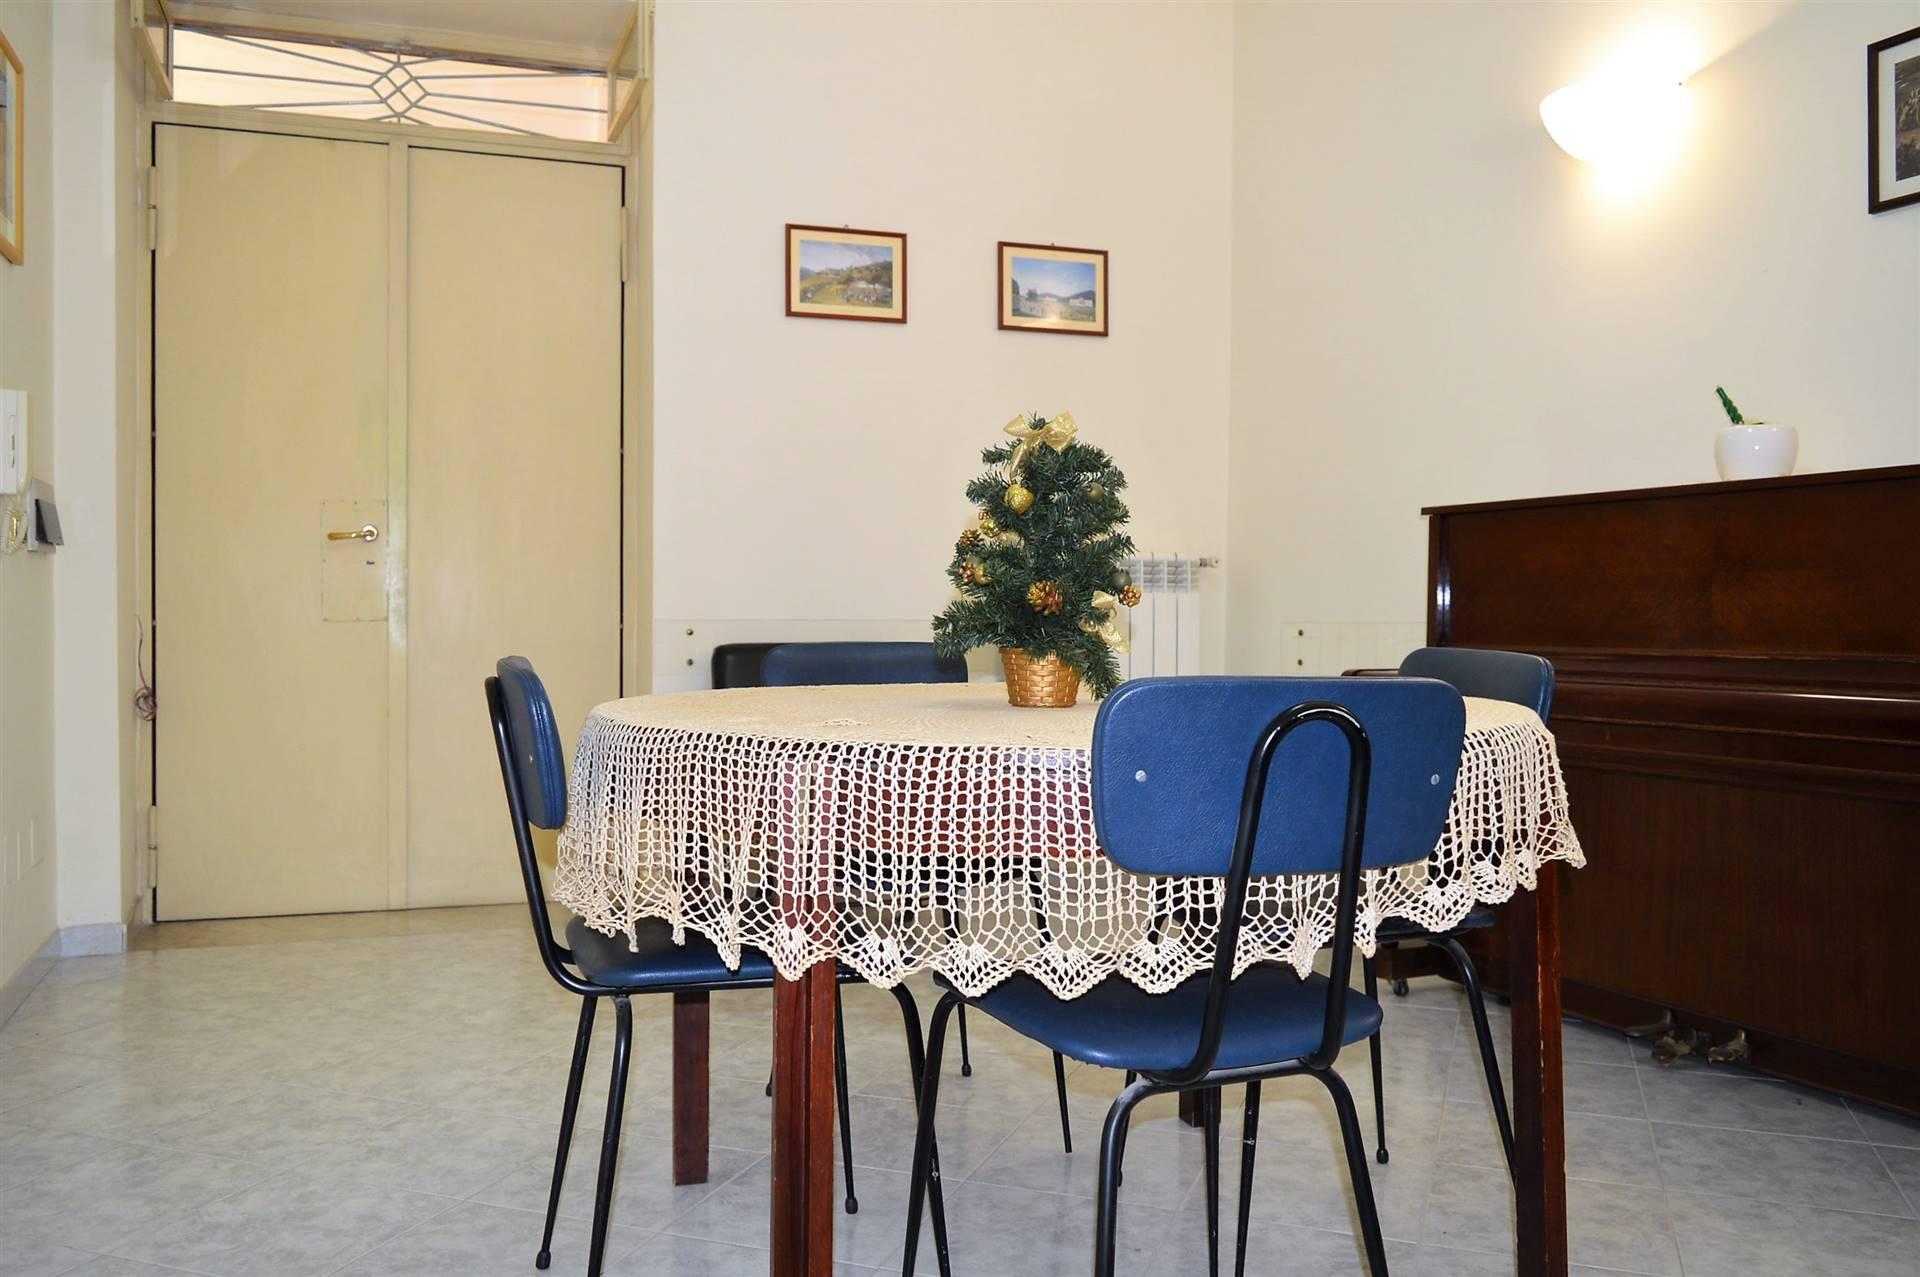 UF051B-Ufficio-SANTA-MARIA-CAPUA-VETERE-Via-Mazzocchi